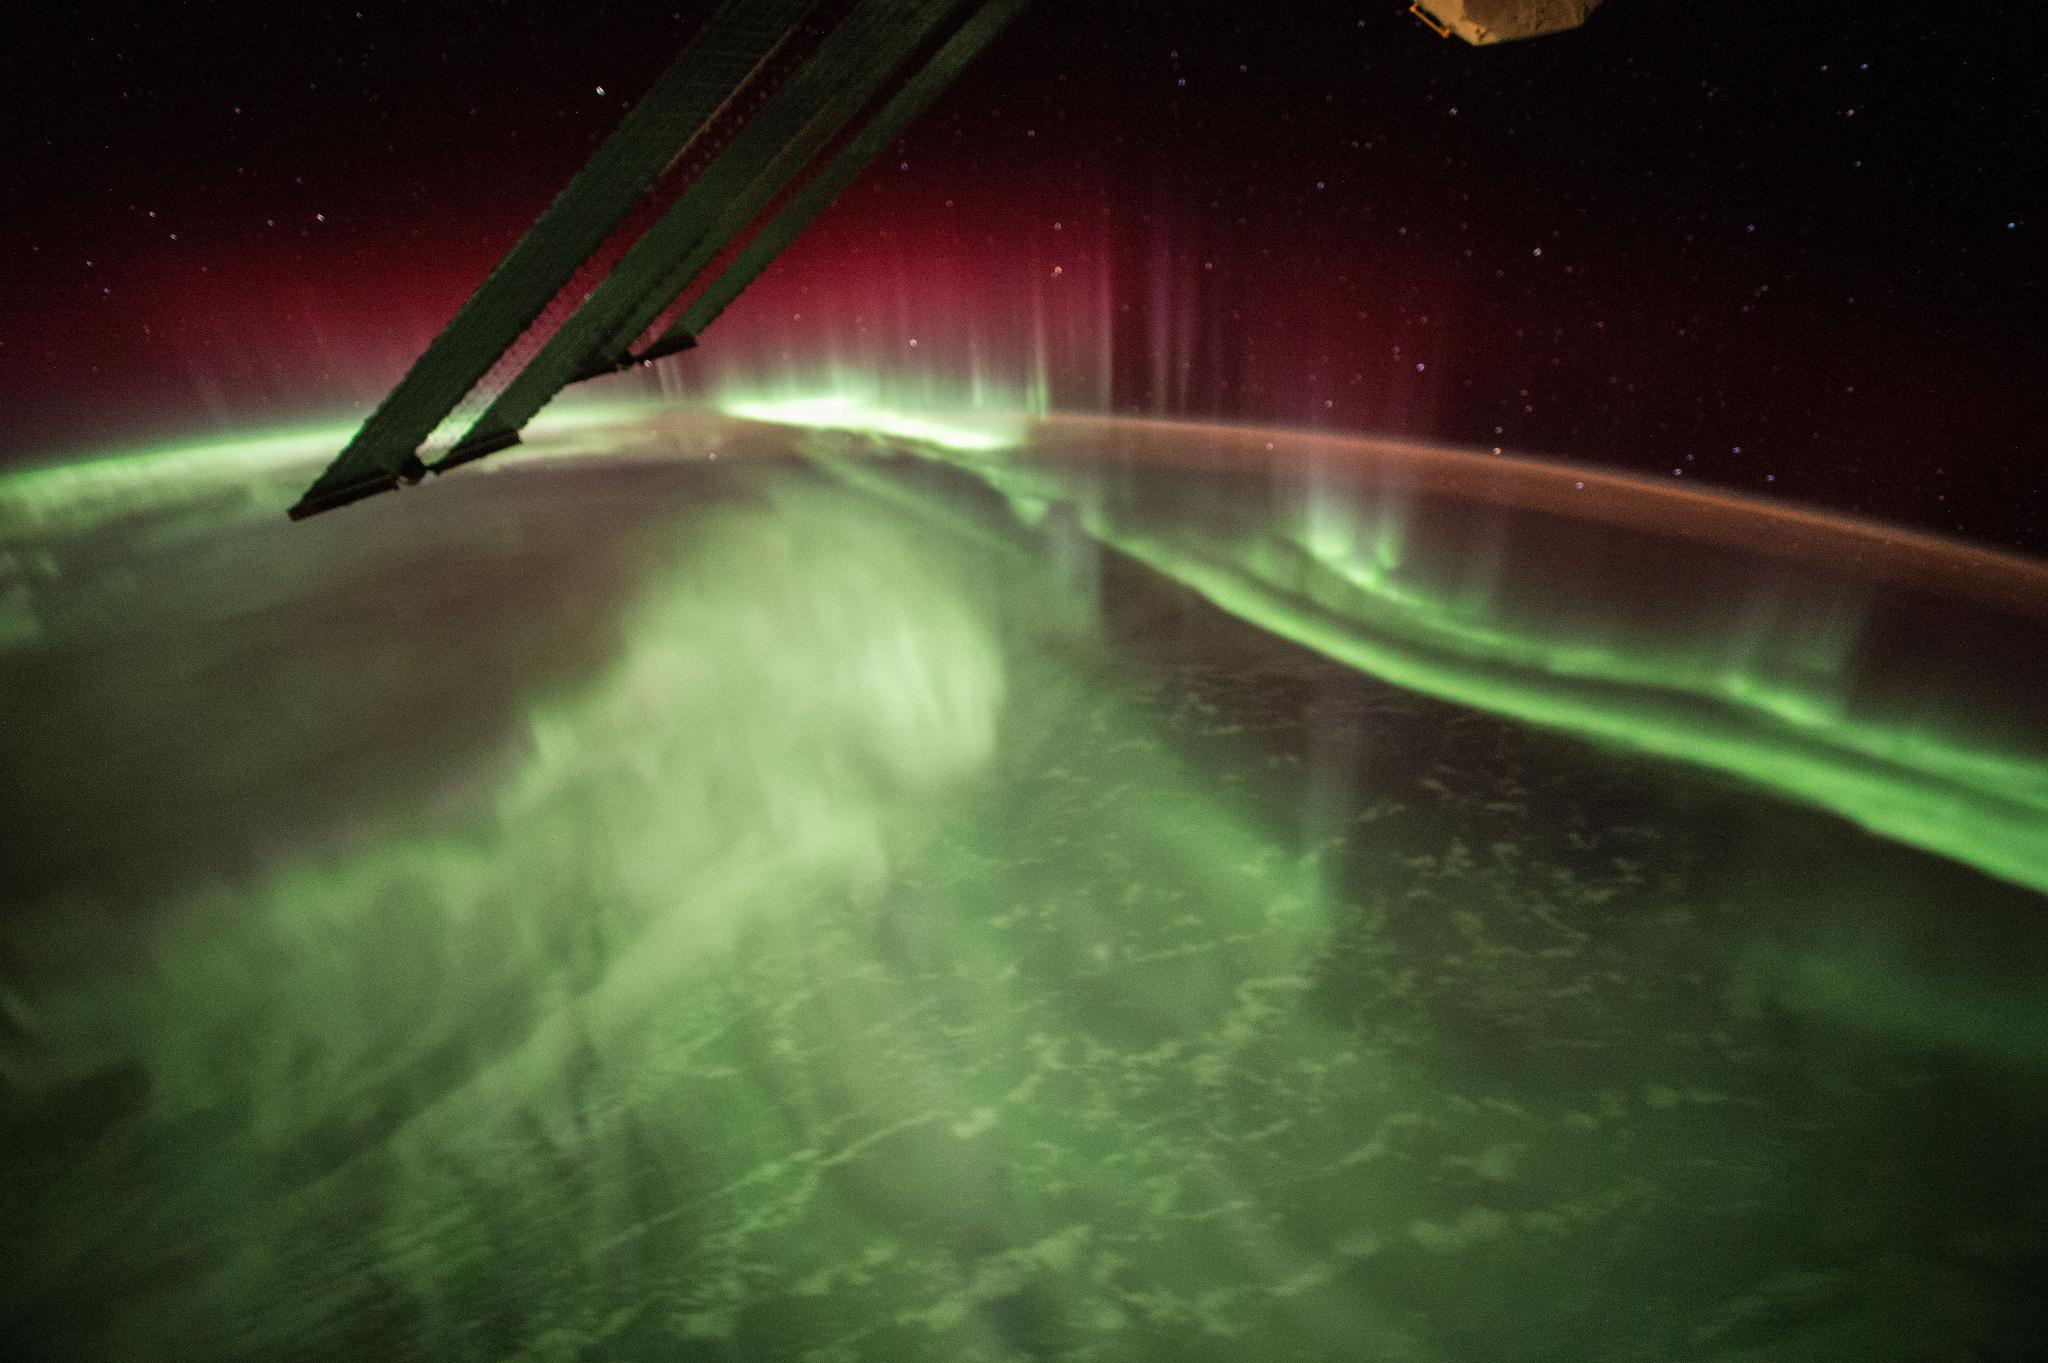 Night Earth Observation of Aurora Borealis